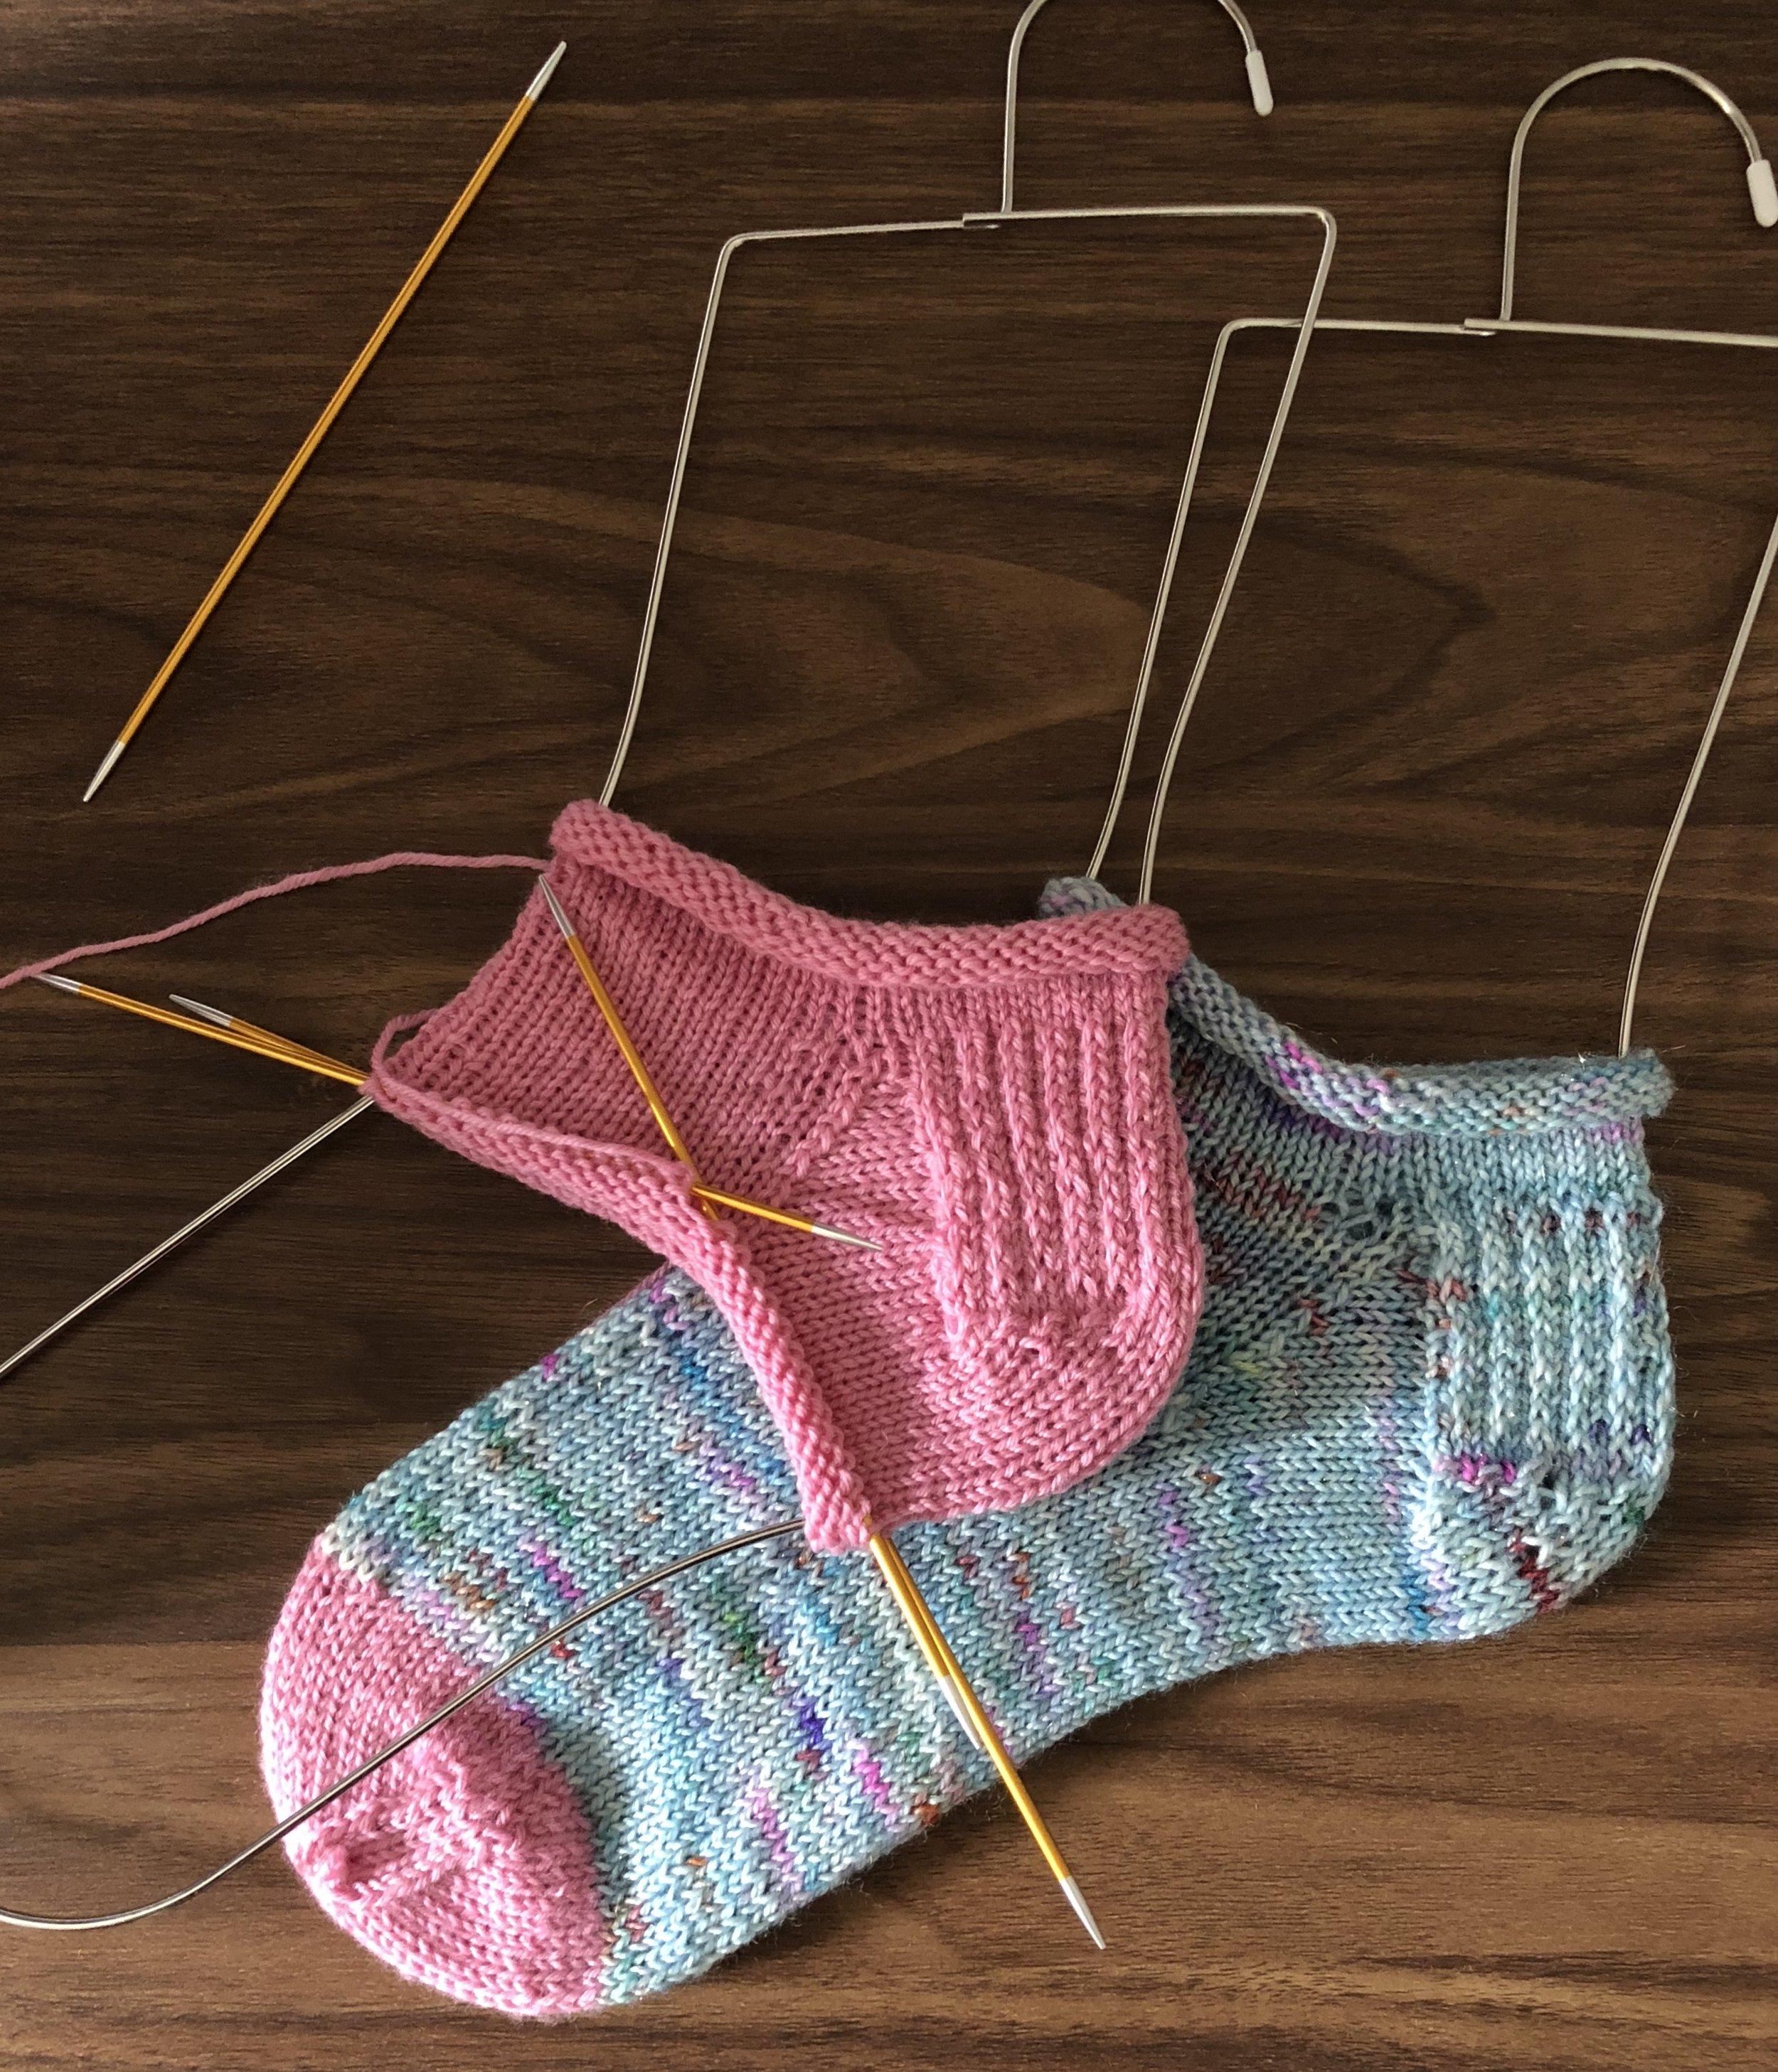 Socks on the blockers